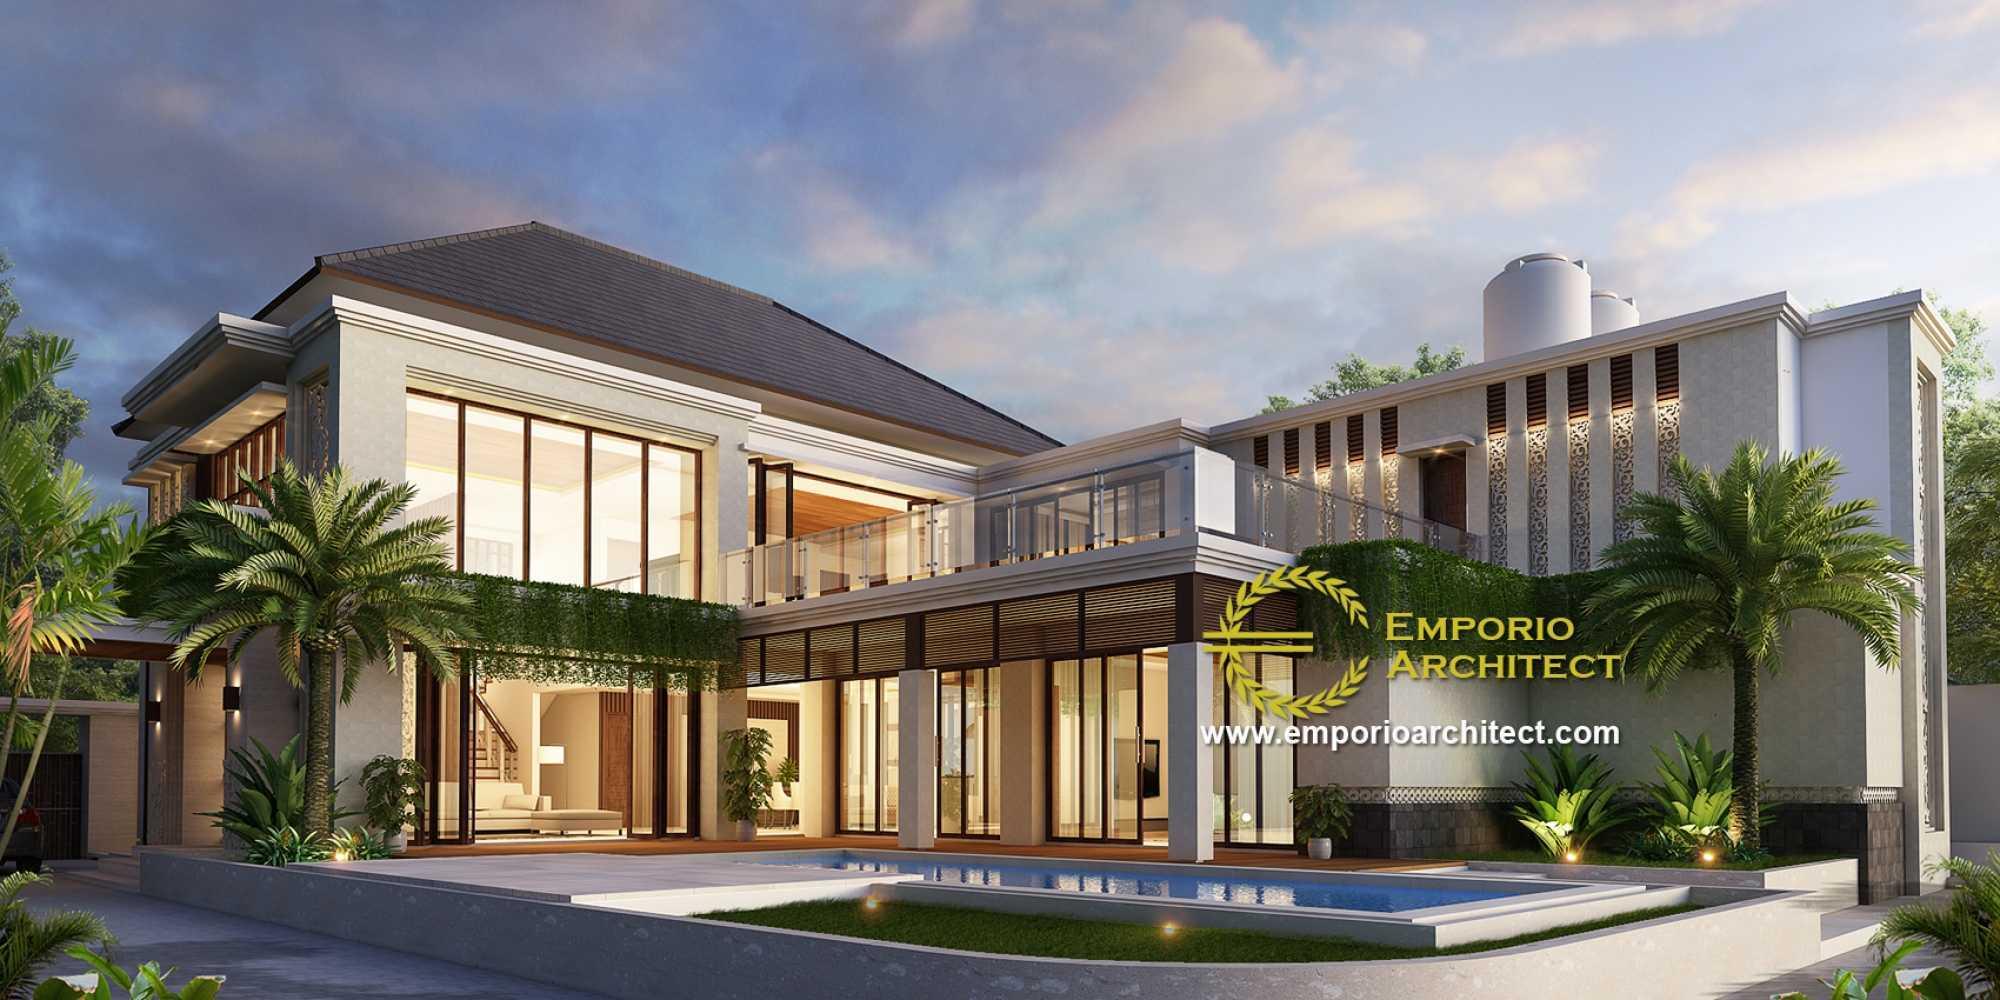 Emporio Architect Desain Rumah Villa Bali Tropis 342 @ Aceh Aceh, Indonesia Aceh, Indonesia Emporio-Architect-Desain-Rumah-Villa-Bali-Tropis-342-Aceh  75446